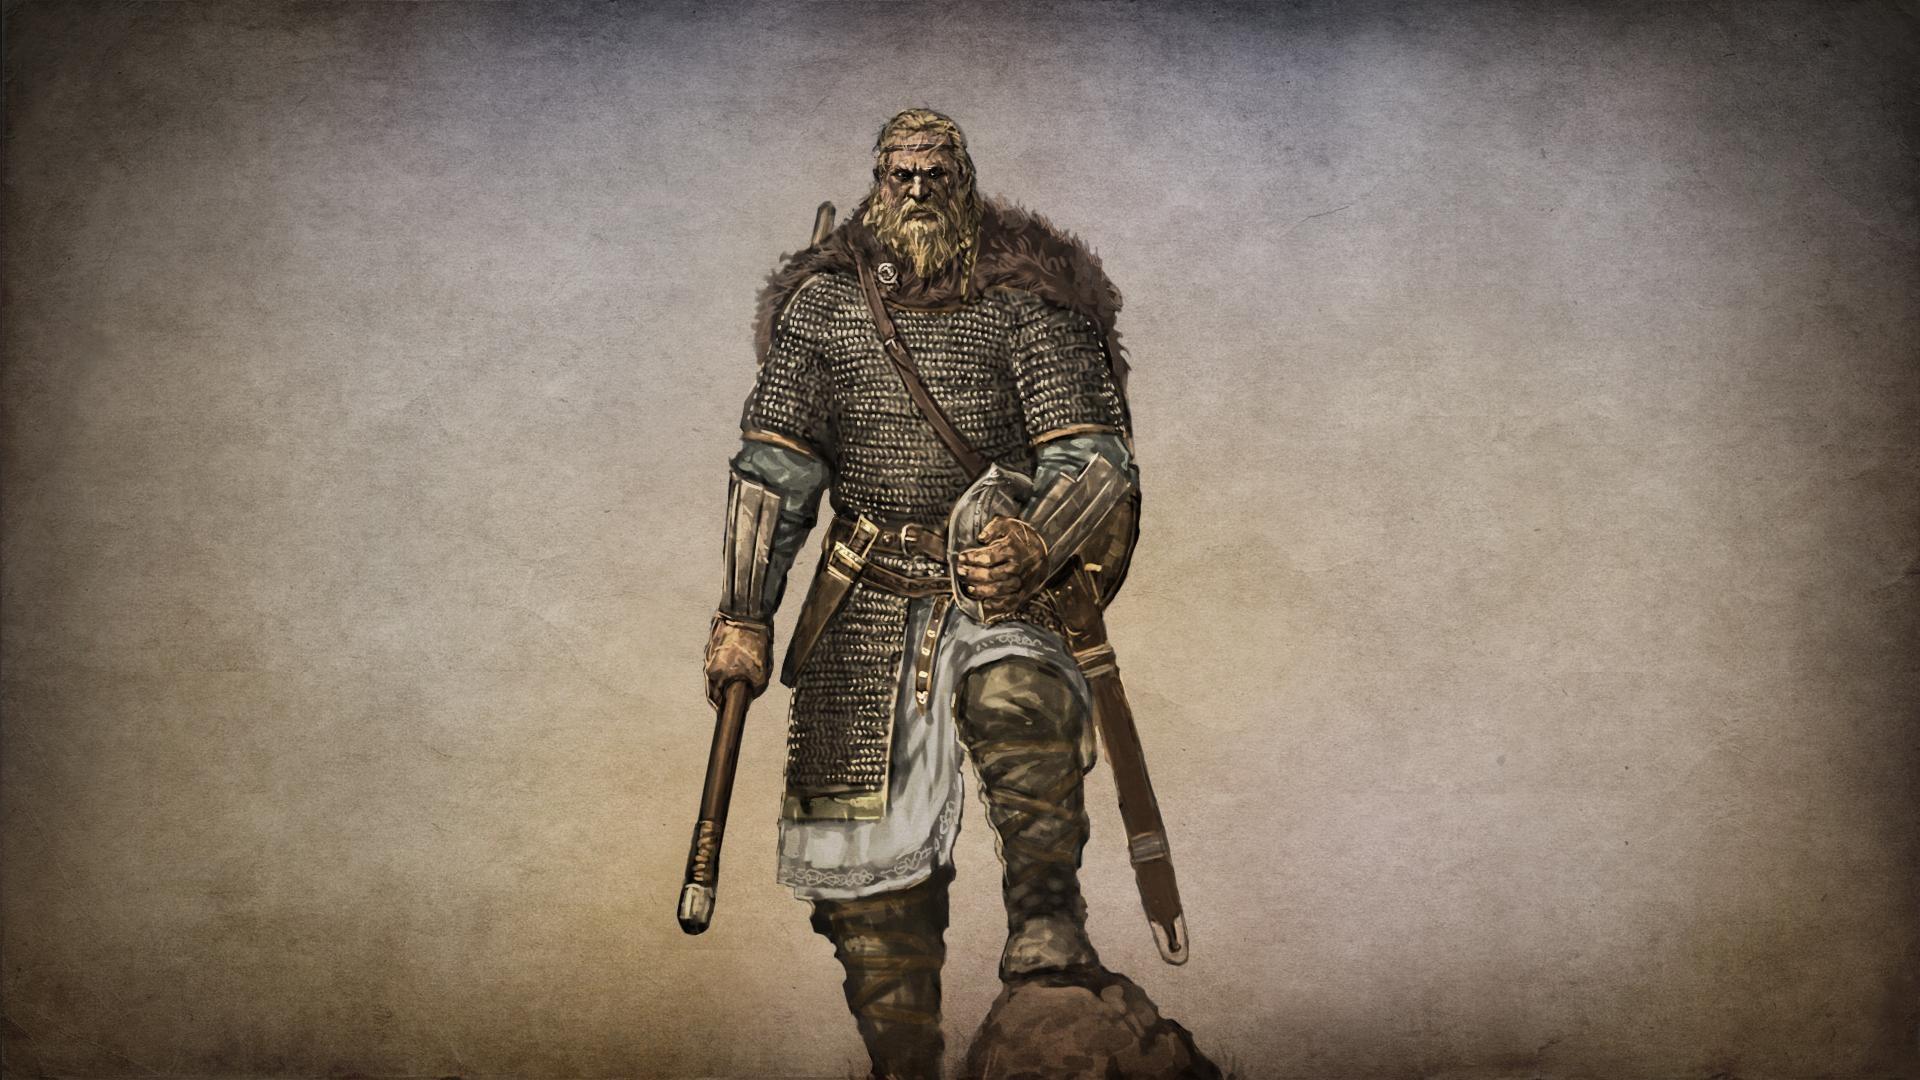 wallpaper.wiki-Vikings-Images-Download-PIC-WPE00336